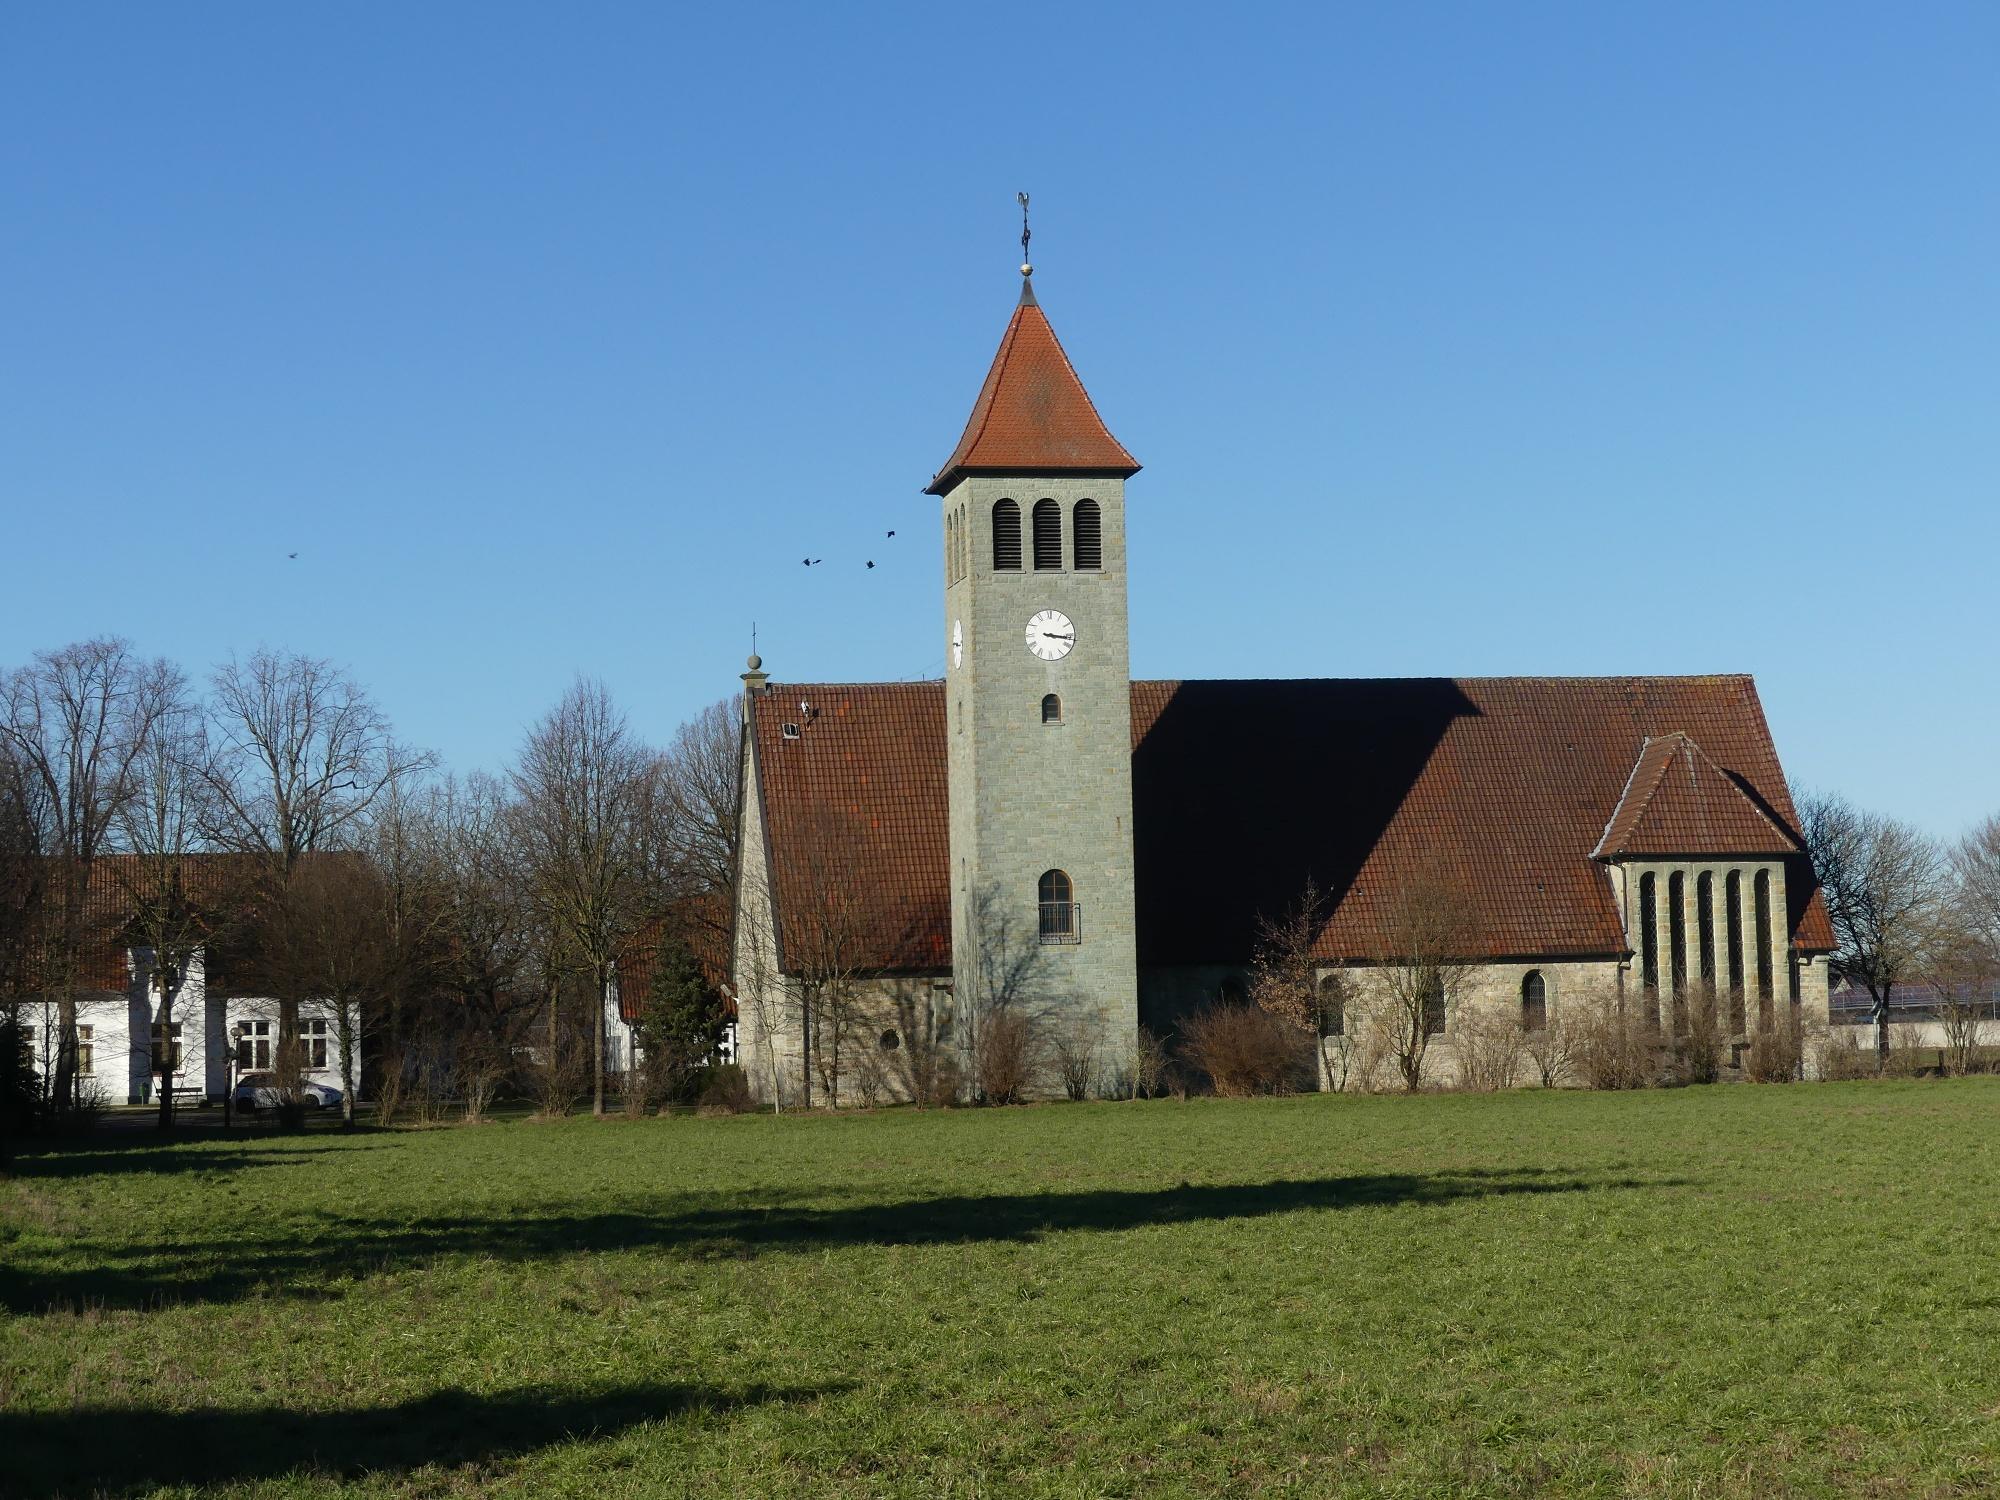 Kirche St. Josef in Anreppen